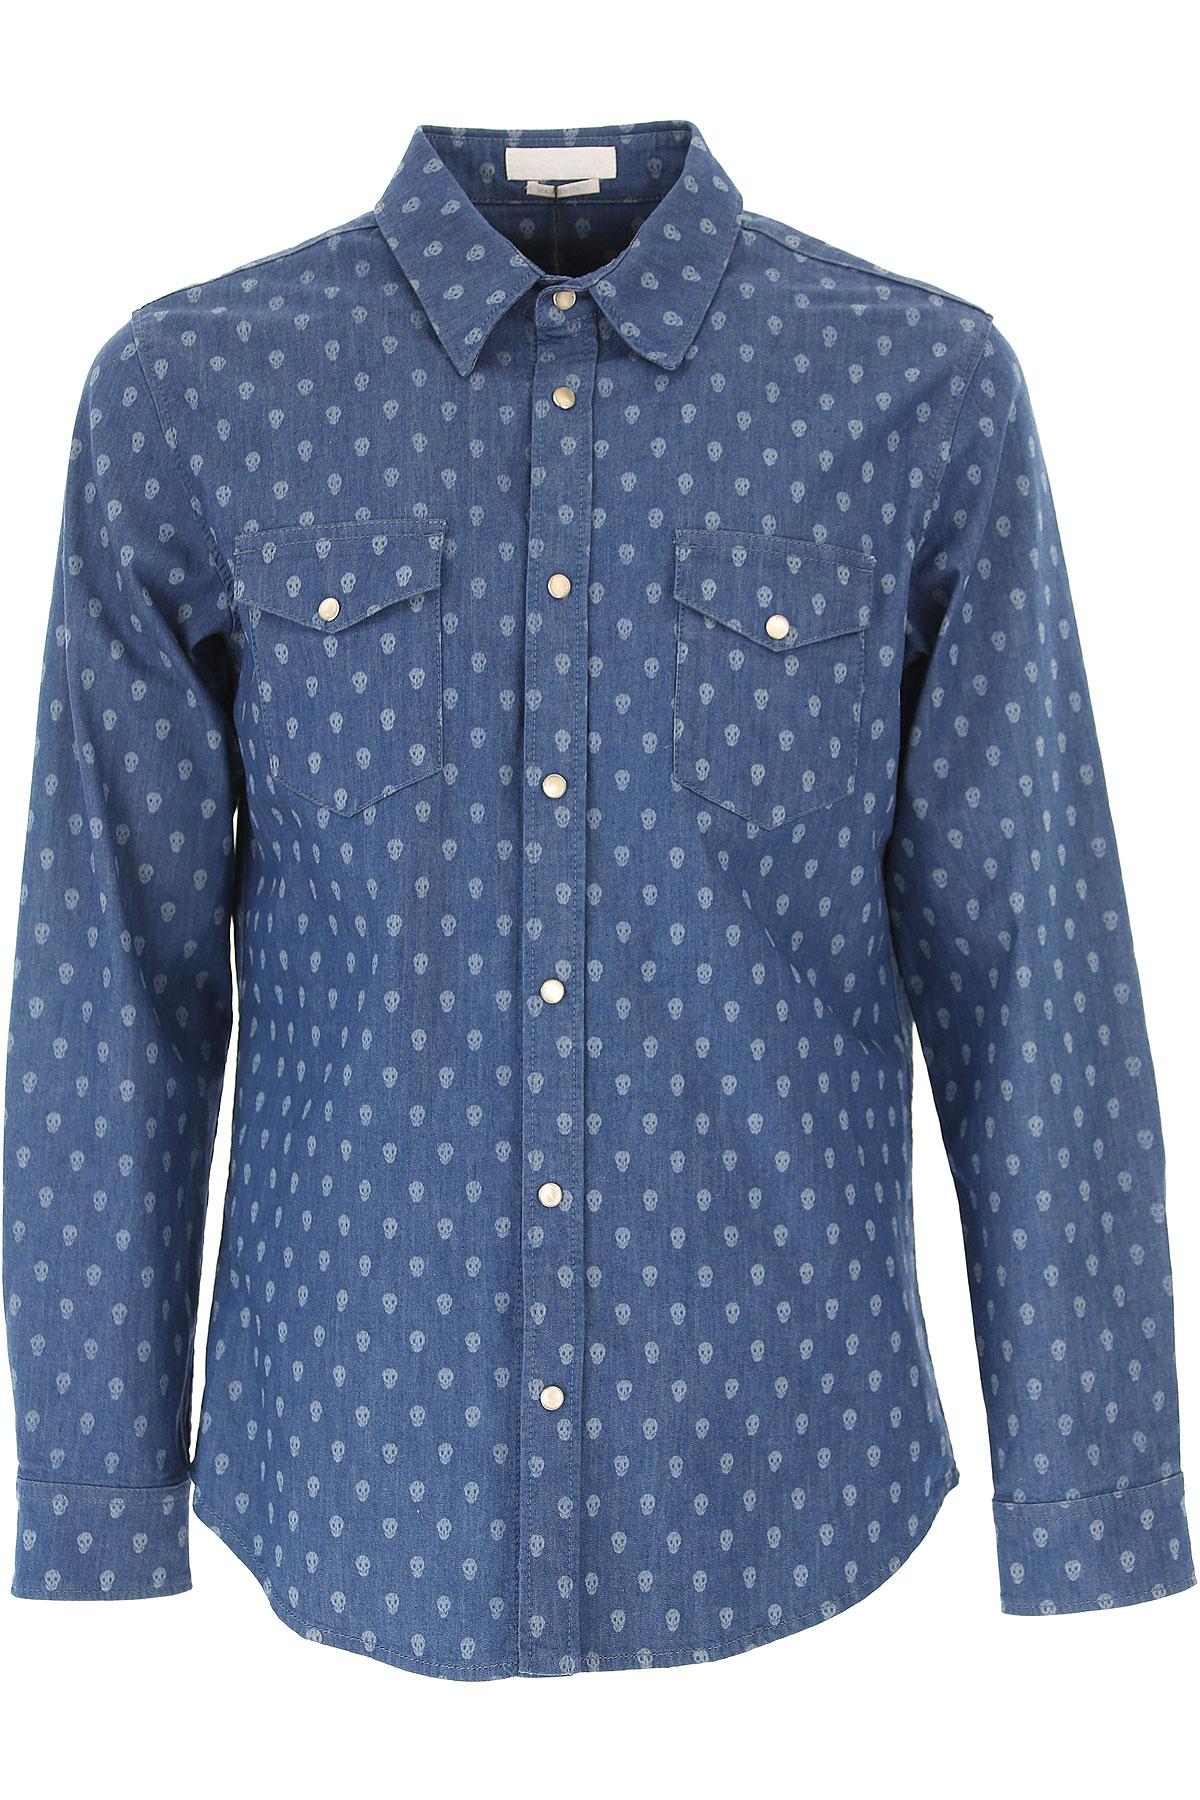 Image of Alexander McQueen Shirt for Men On Sale in Outlet, Blue Denim, Cotton, 2017, M S